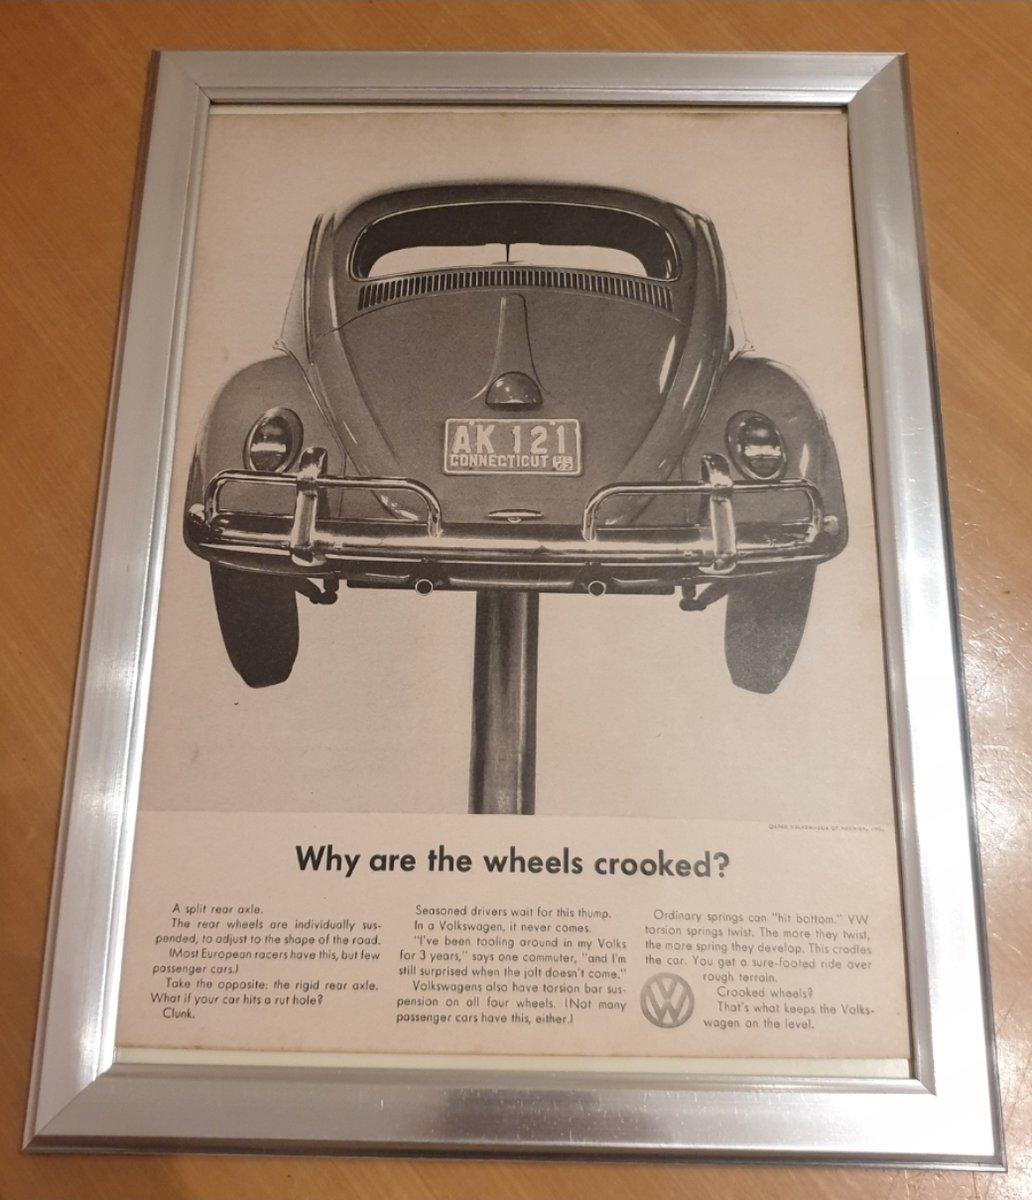 1960 Original 1962 VW Beetle Framed Advert For Sale (picture 1 of 3)